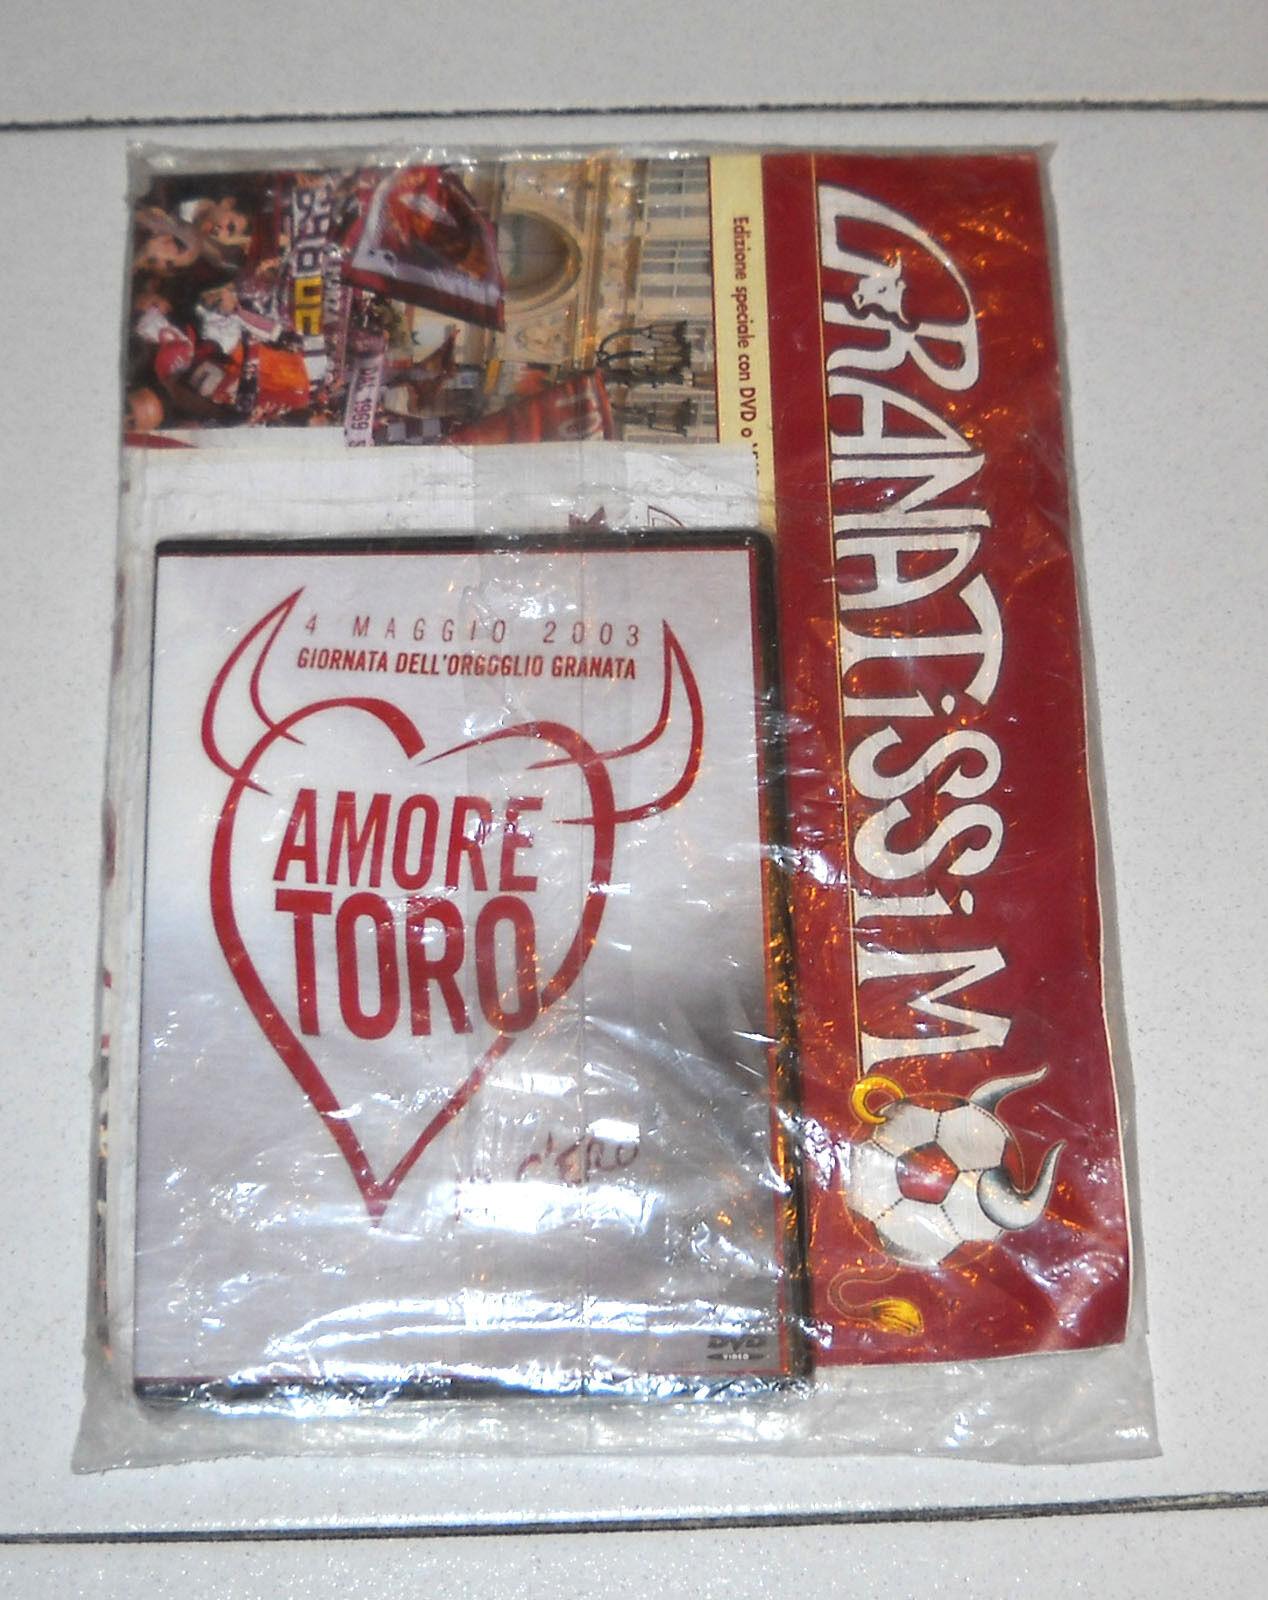 AMORE TORO - LIMITED EDITION (ADESIVI + RIVISTA) (VHS)